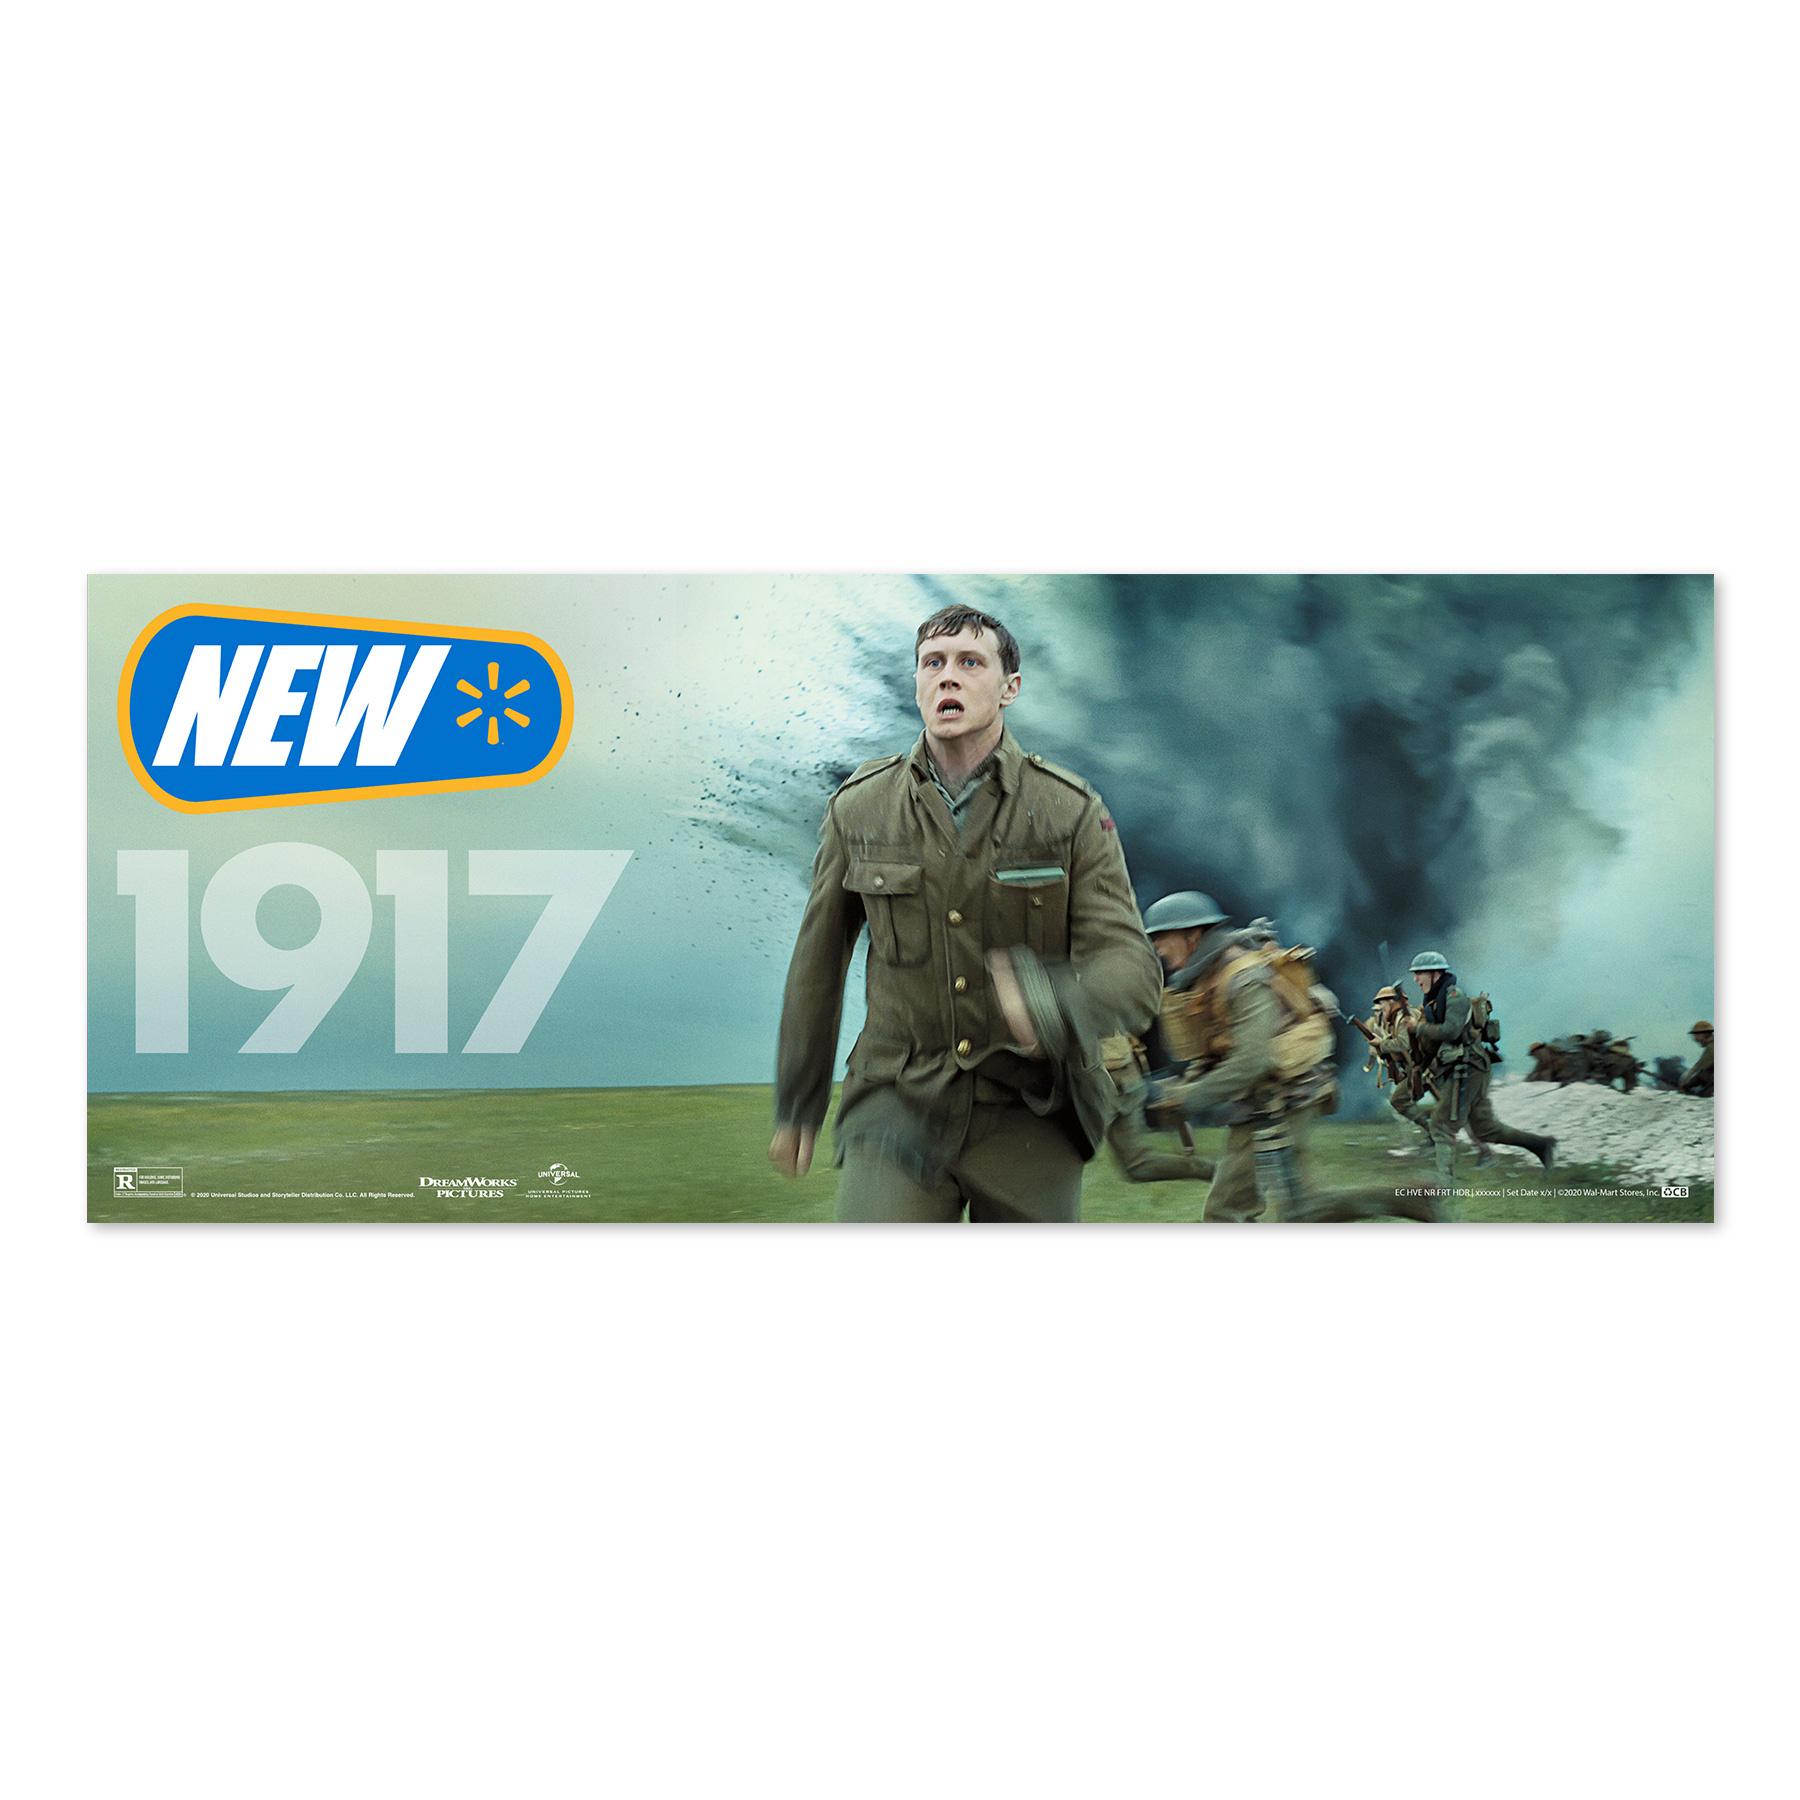 1917 Walmart New Release Sign